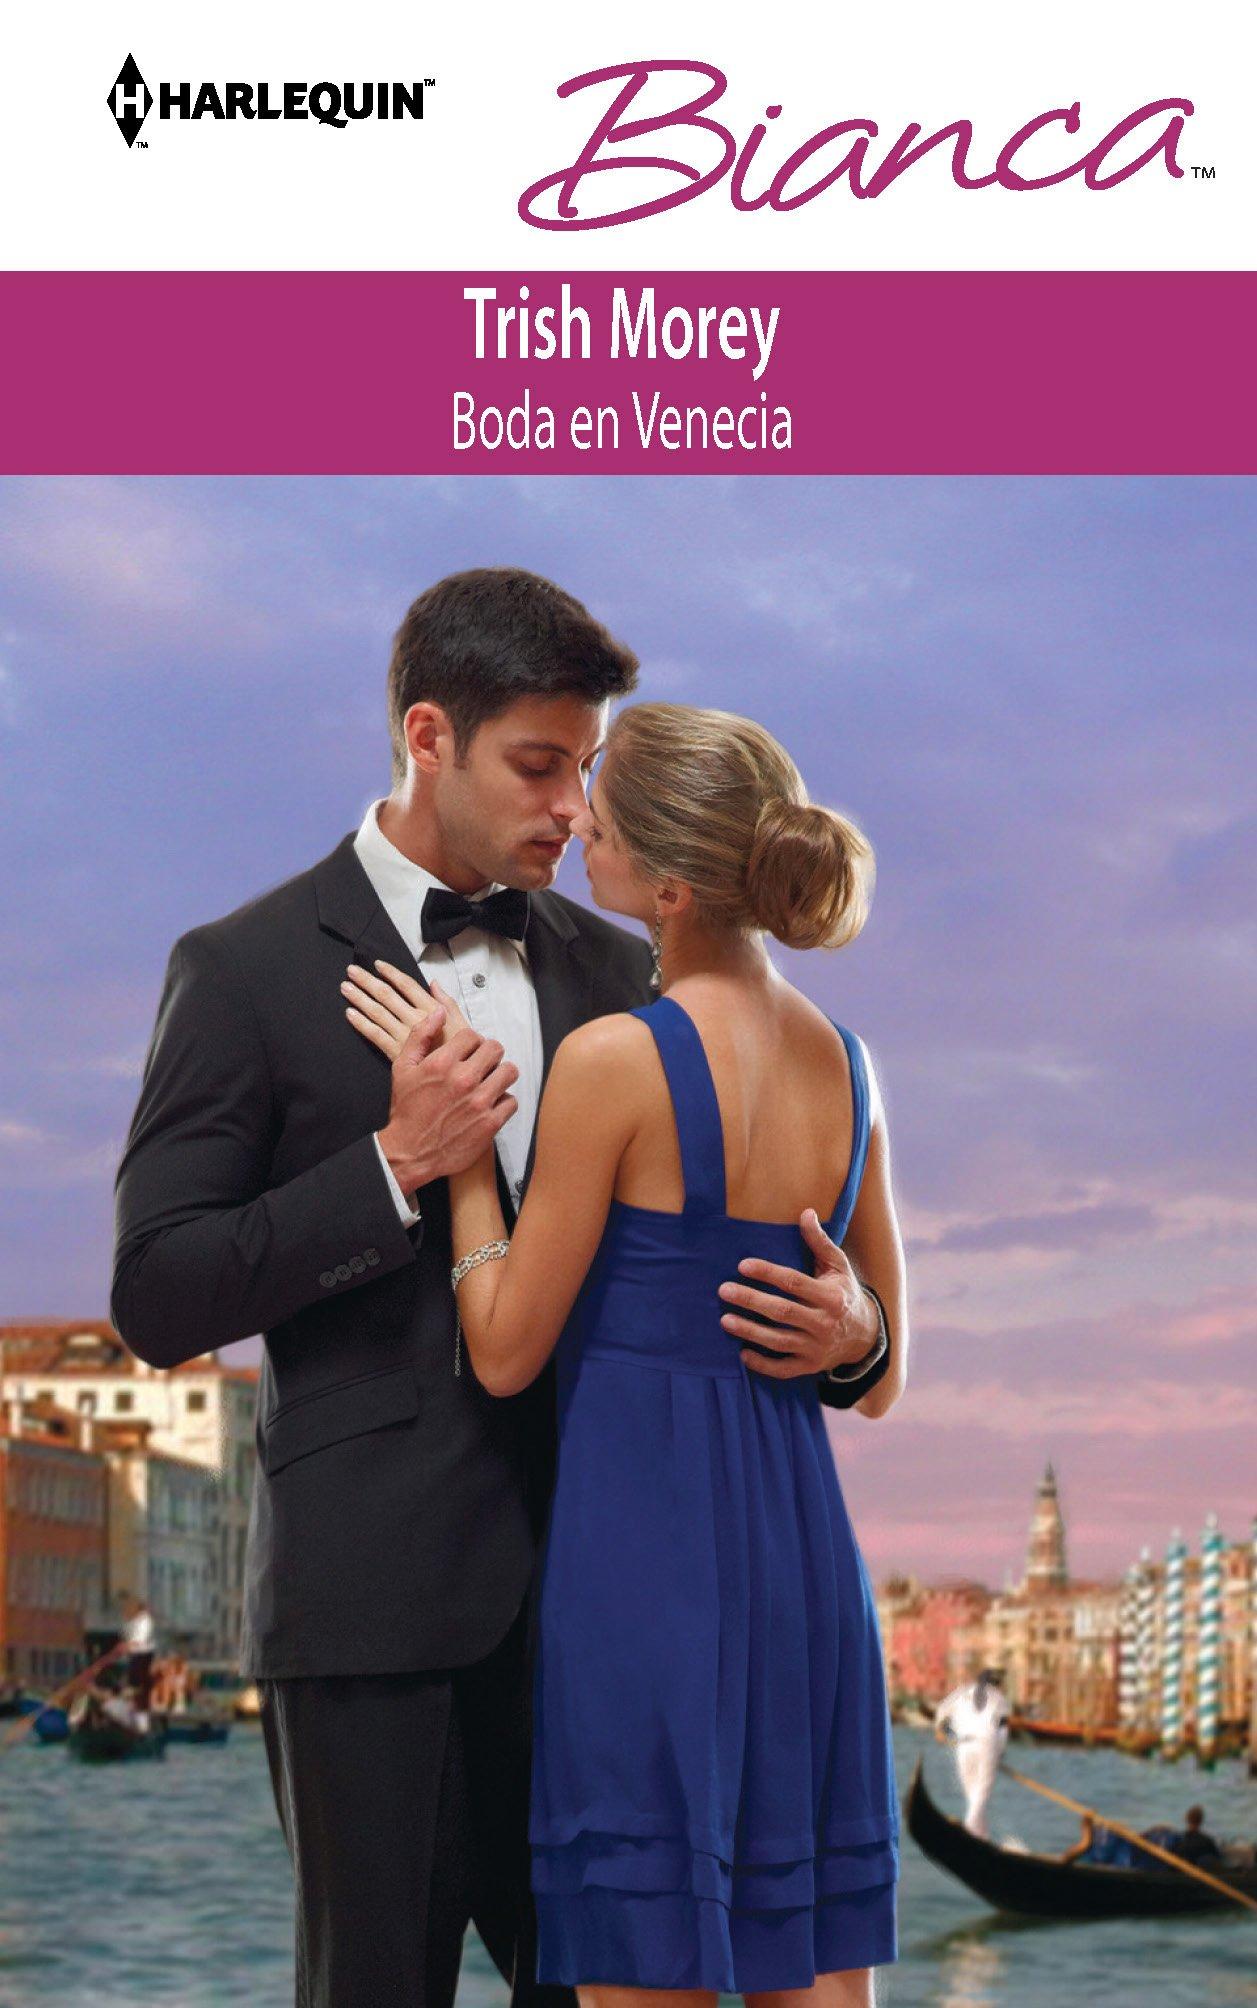 Boda En Venecia Harlequin Bianca Bartering Her Innocence Spanish Edition Morey Trish 9780373518234 Books